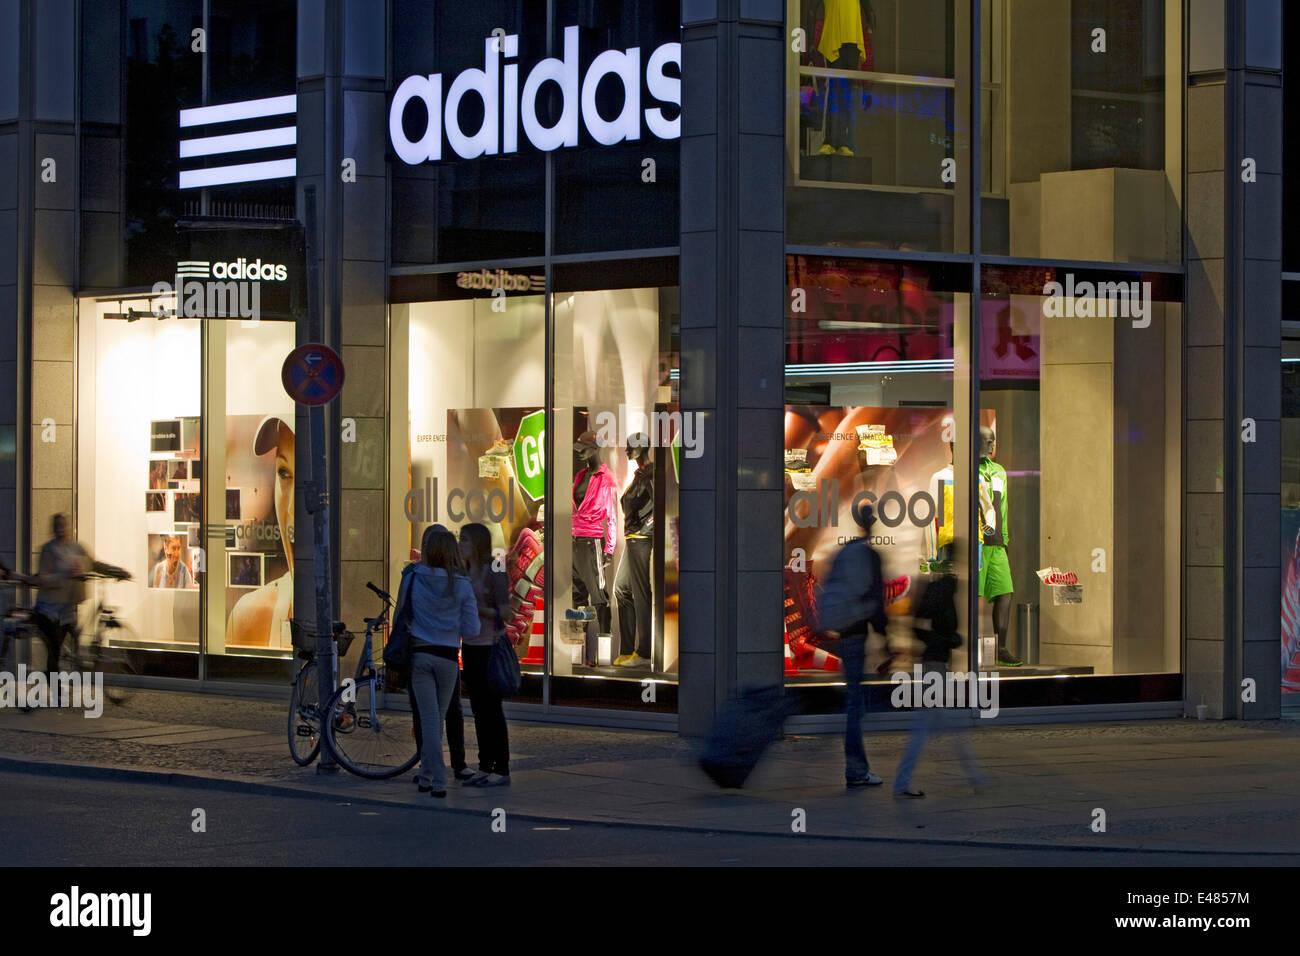 Adidas flagship store Stock Photo: 71479848 Alamy